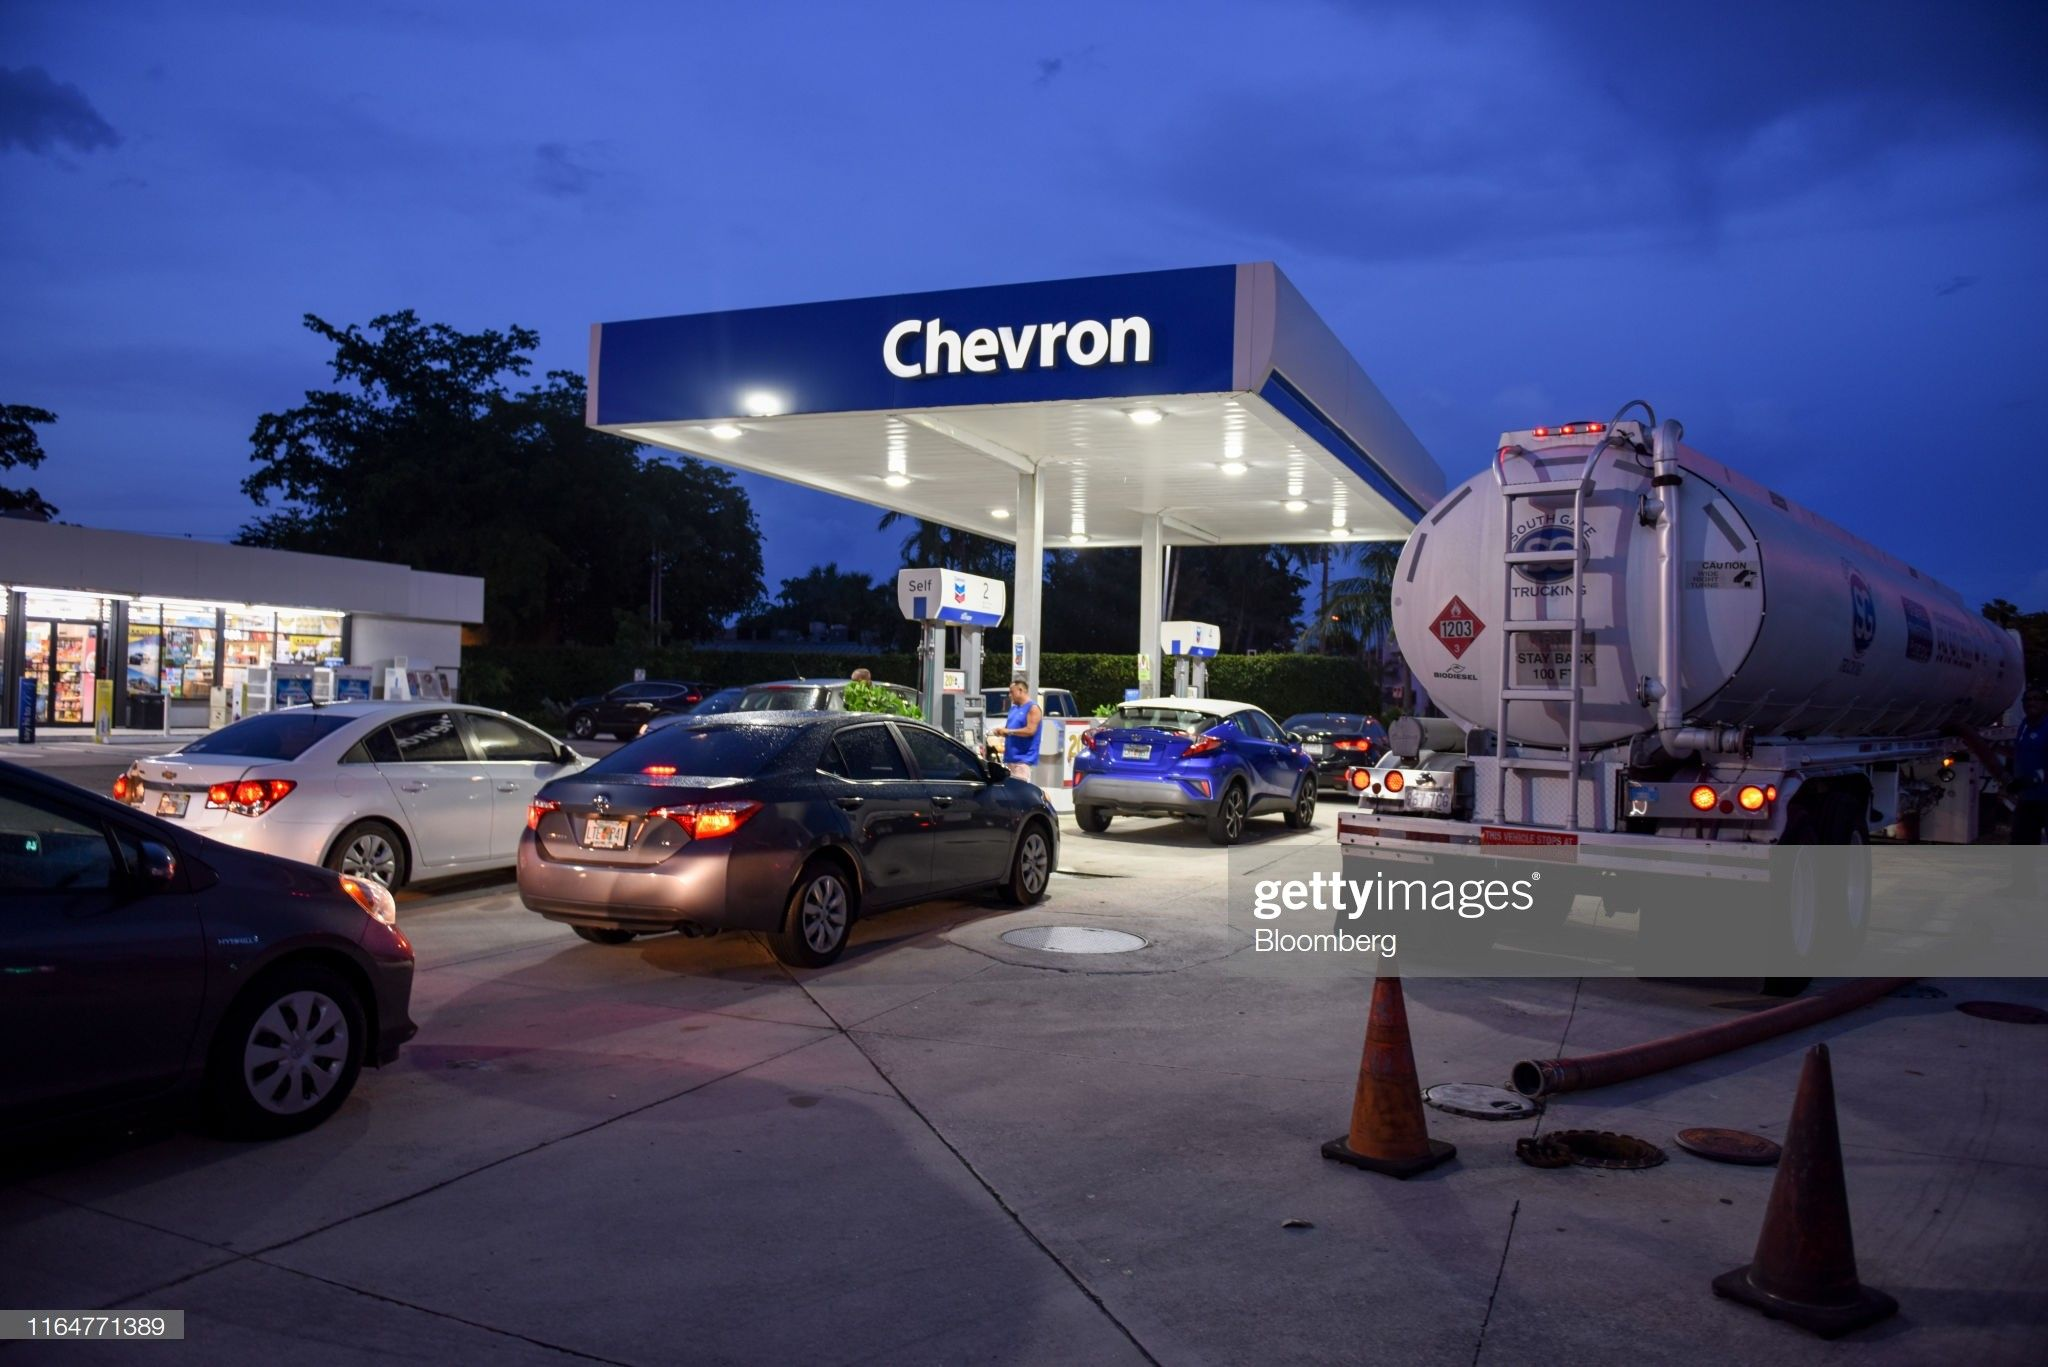 Imagen de Juda Ren en A Tribute to Chevron Gas Stations